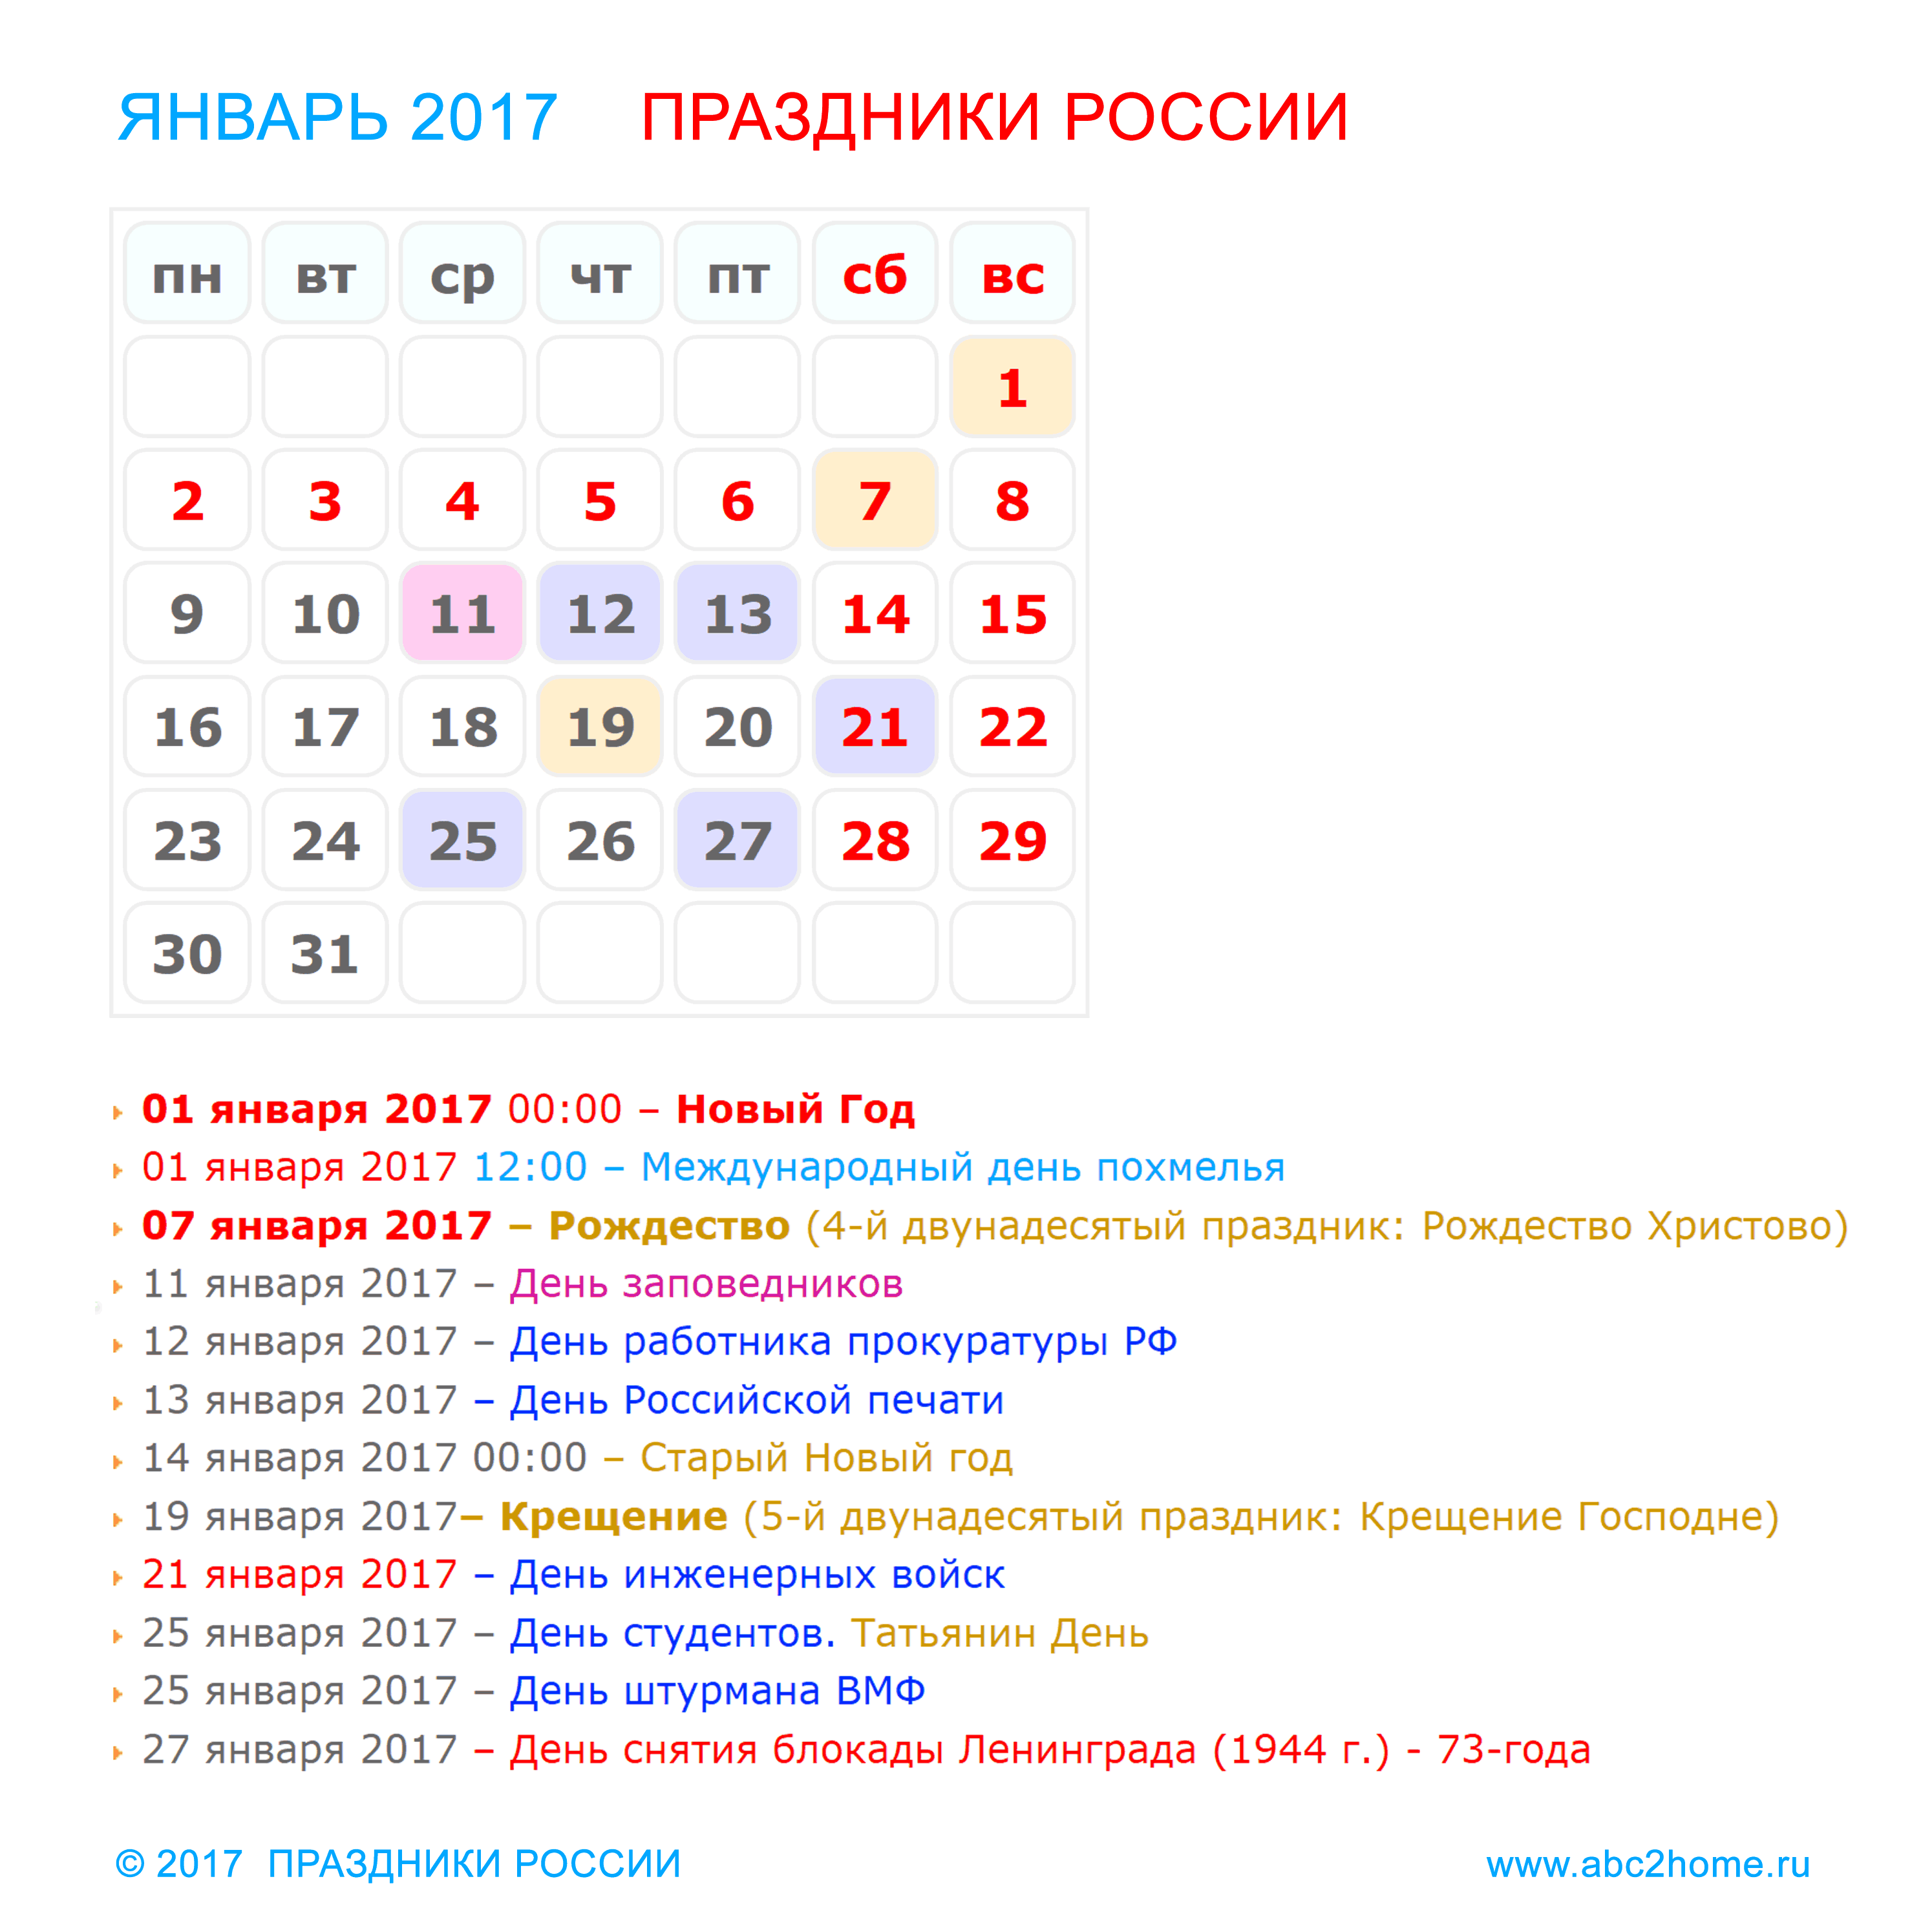 prazdniki_rossii_yanvar_2017.png